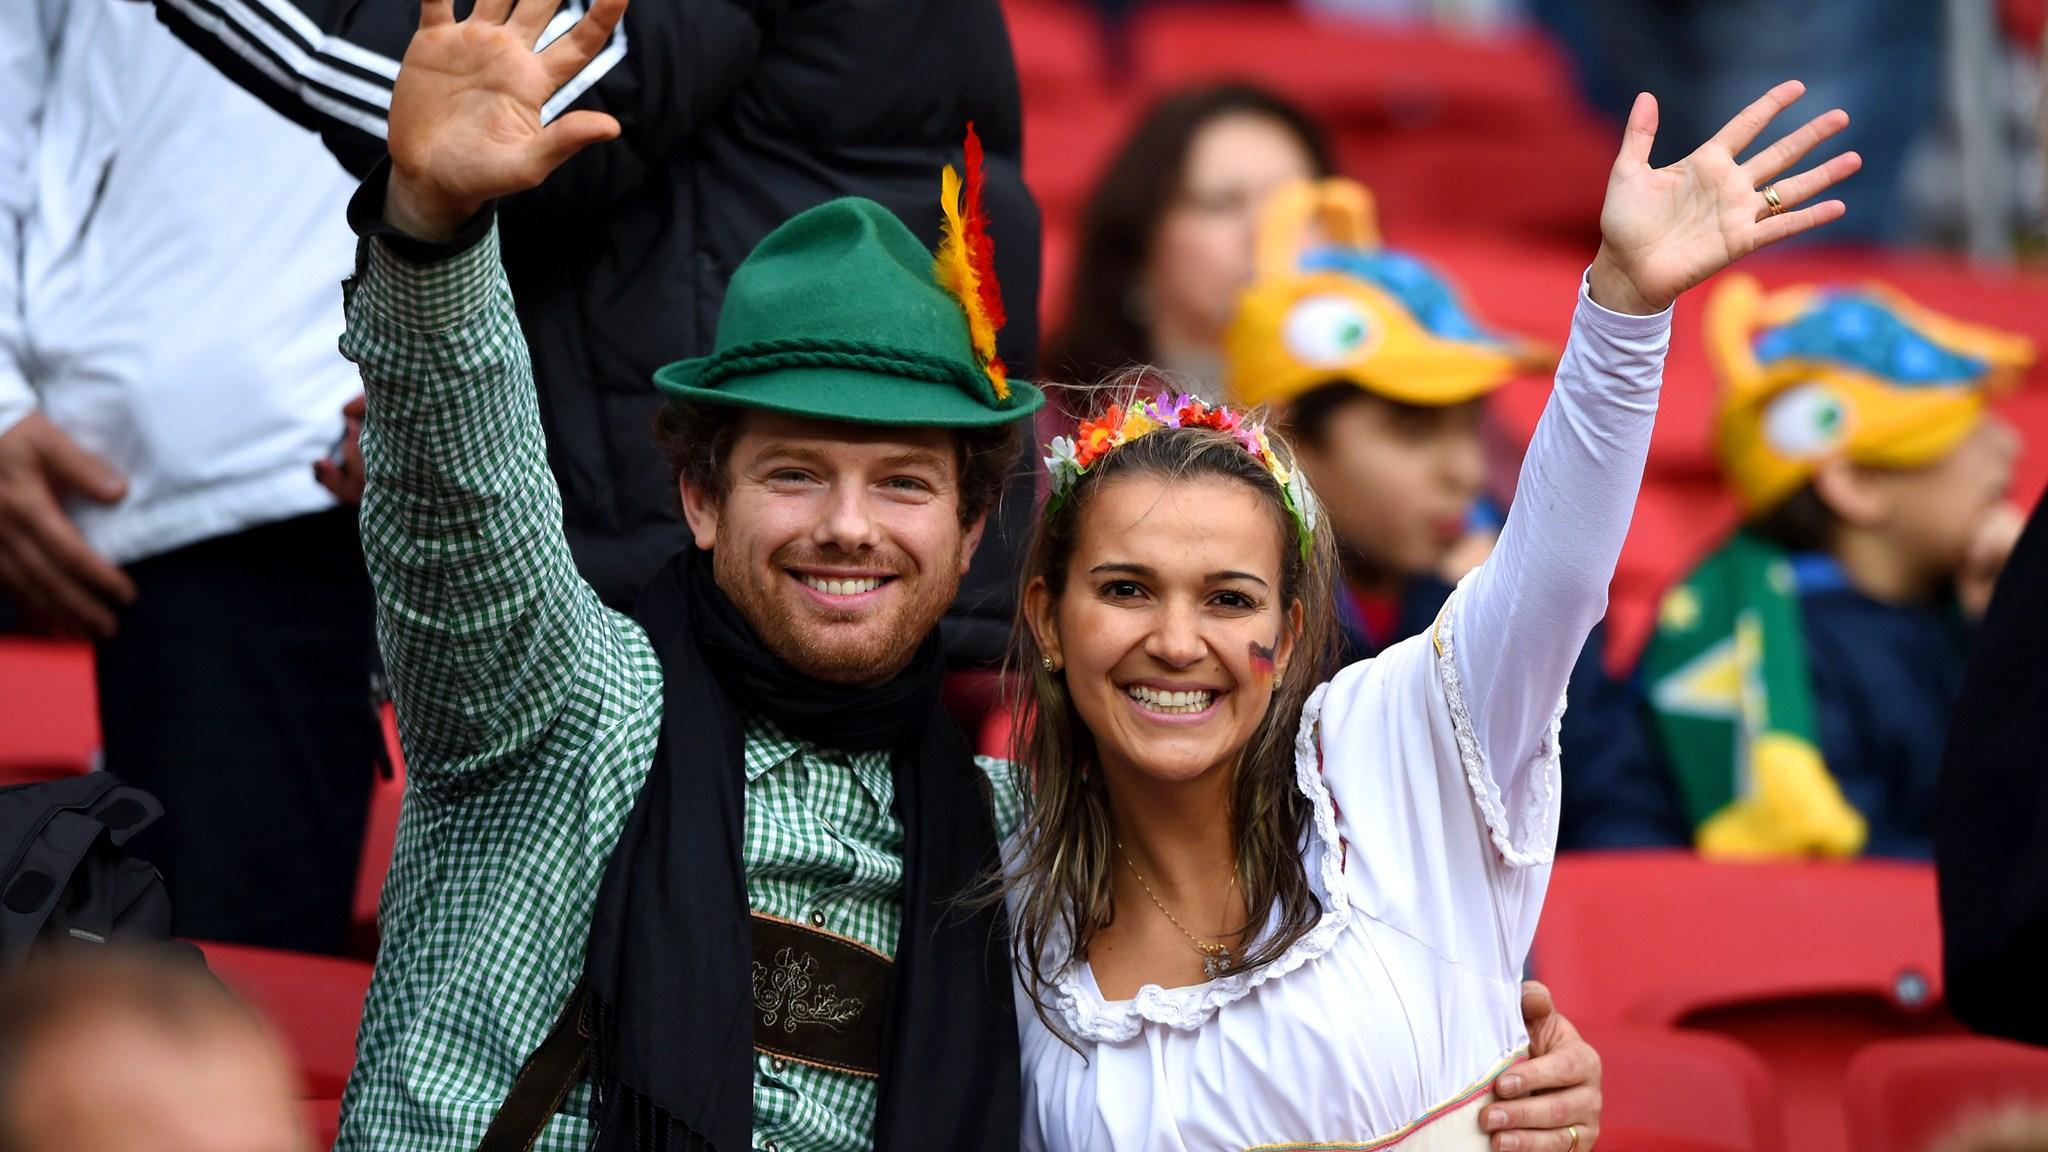 180 - Germany-Algeria [2-1 - Win after extra time ] -- 30 Jun 2014 - 17-00 - kuaza